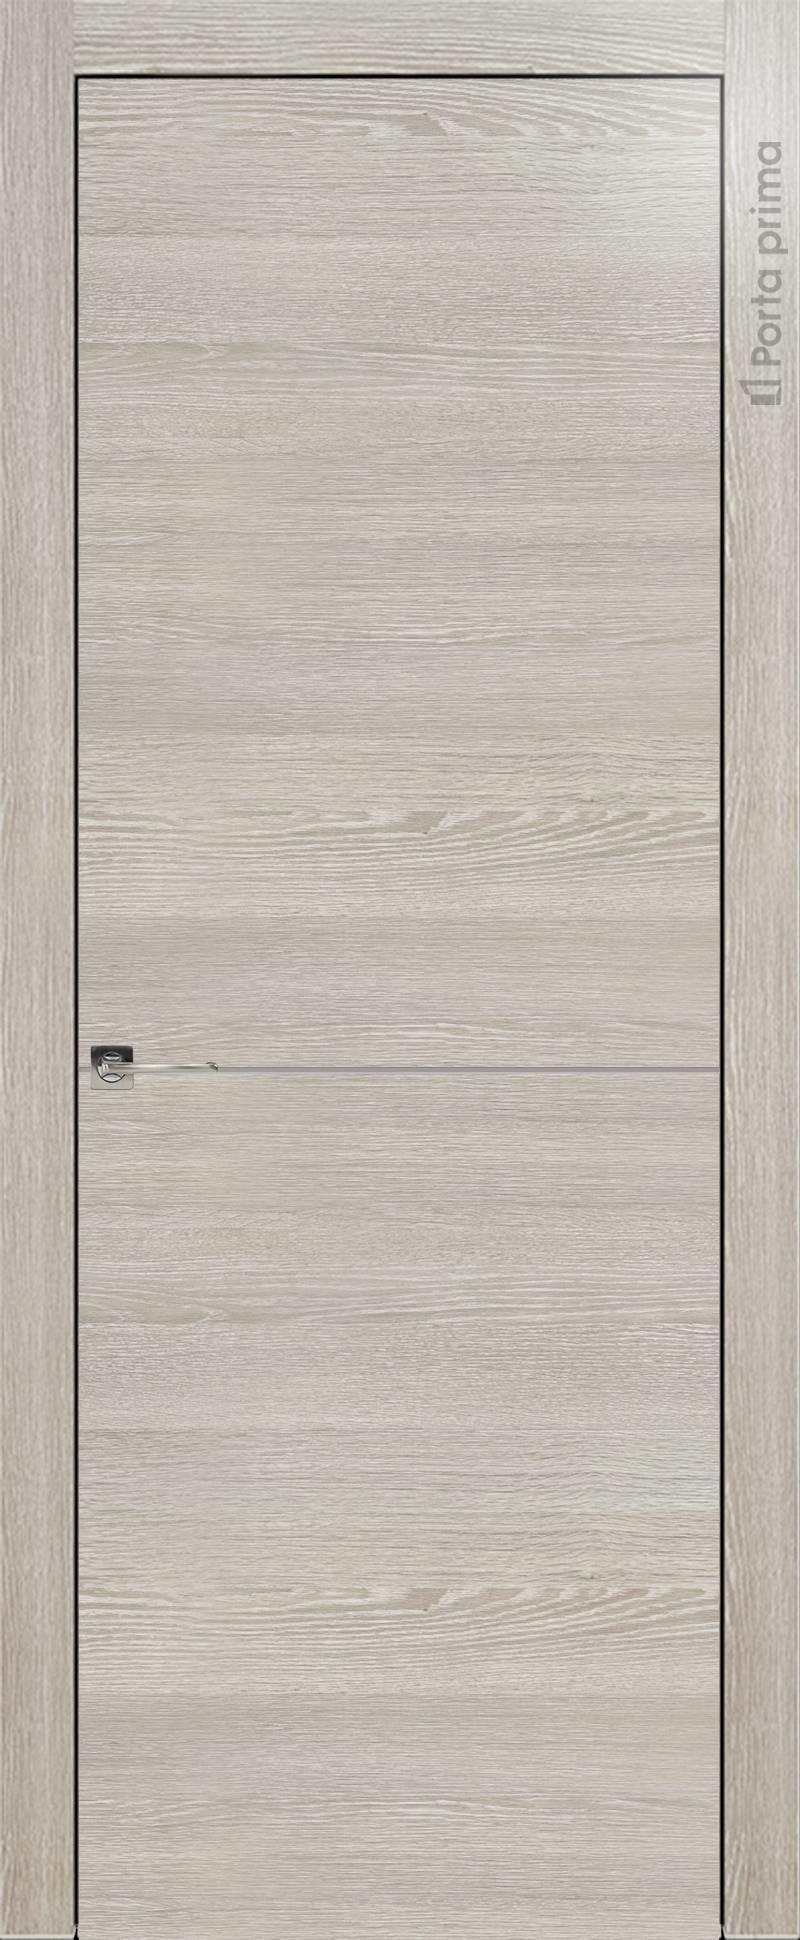 Tivoli Б-2 цвет - Серый дуб Без стекла (ДГ)